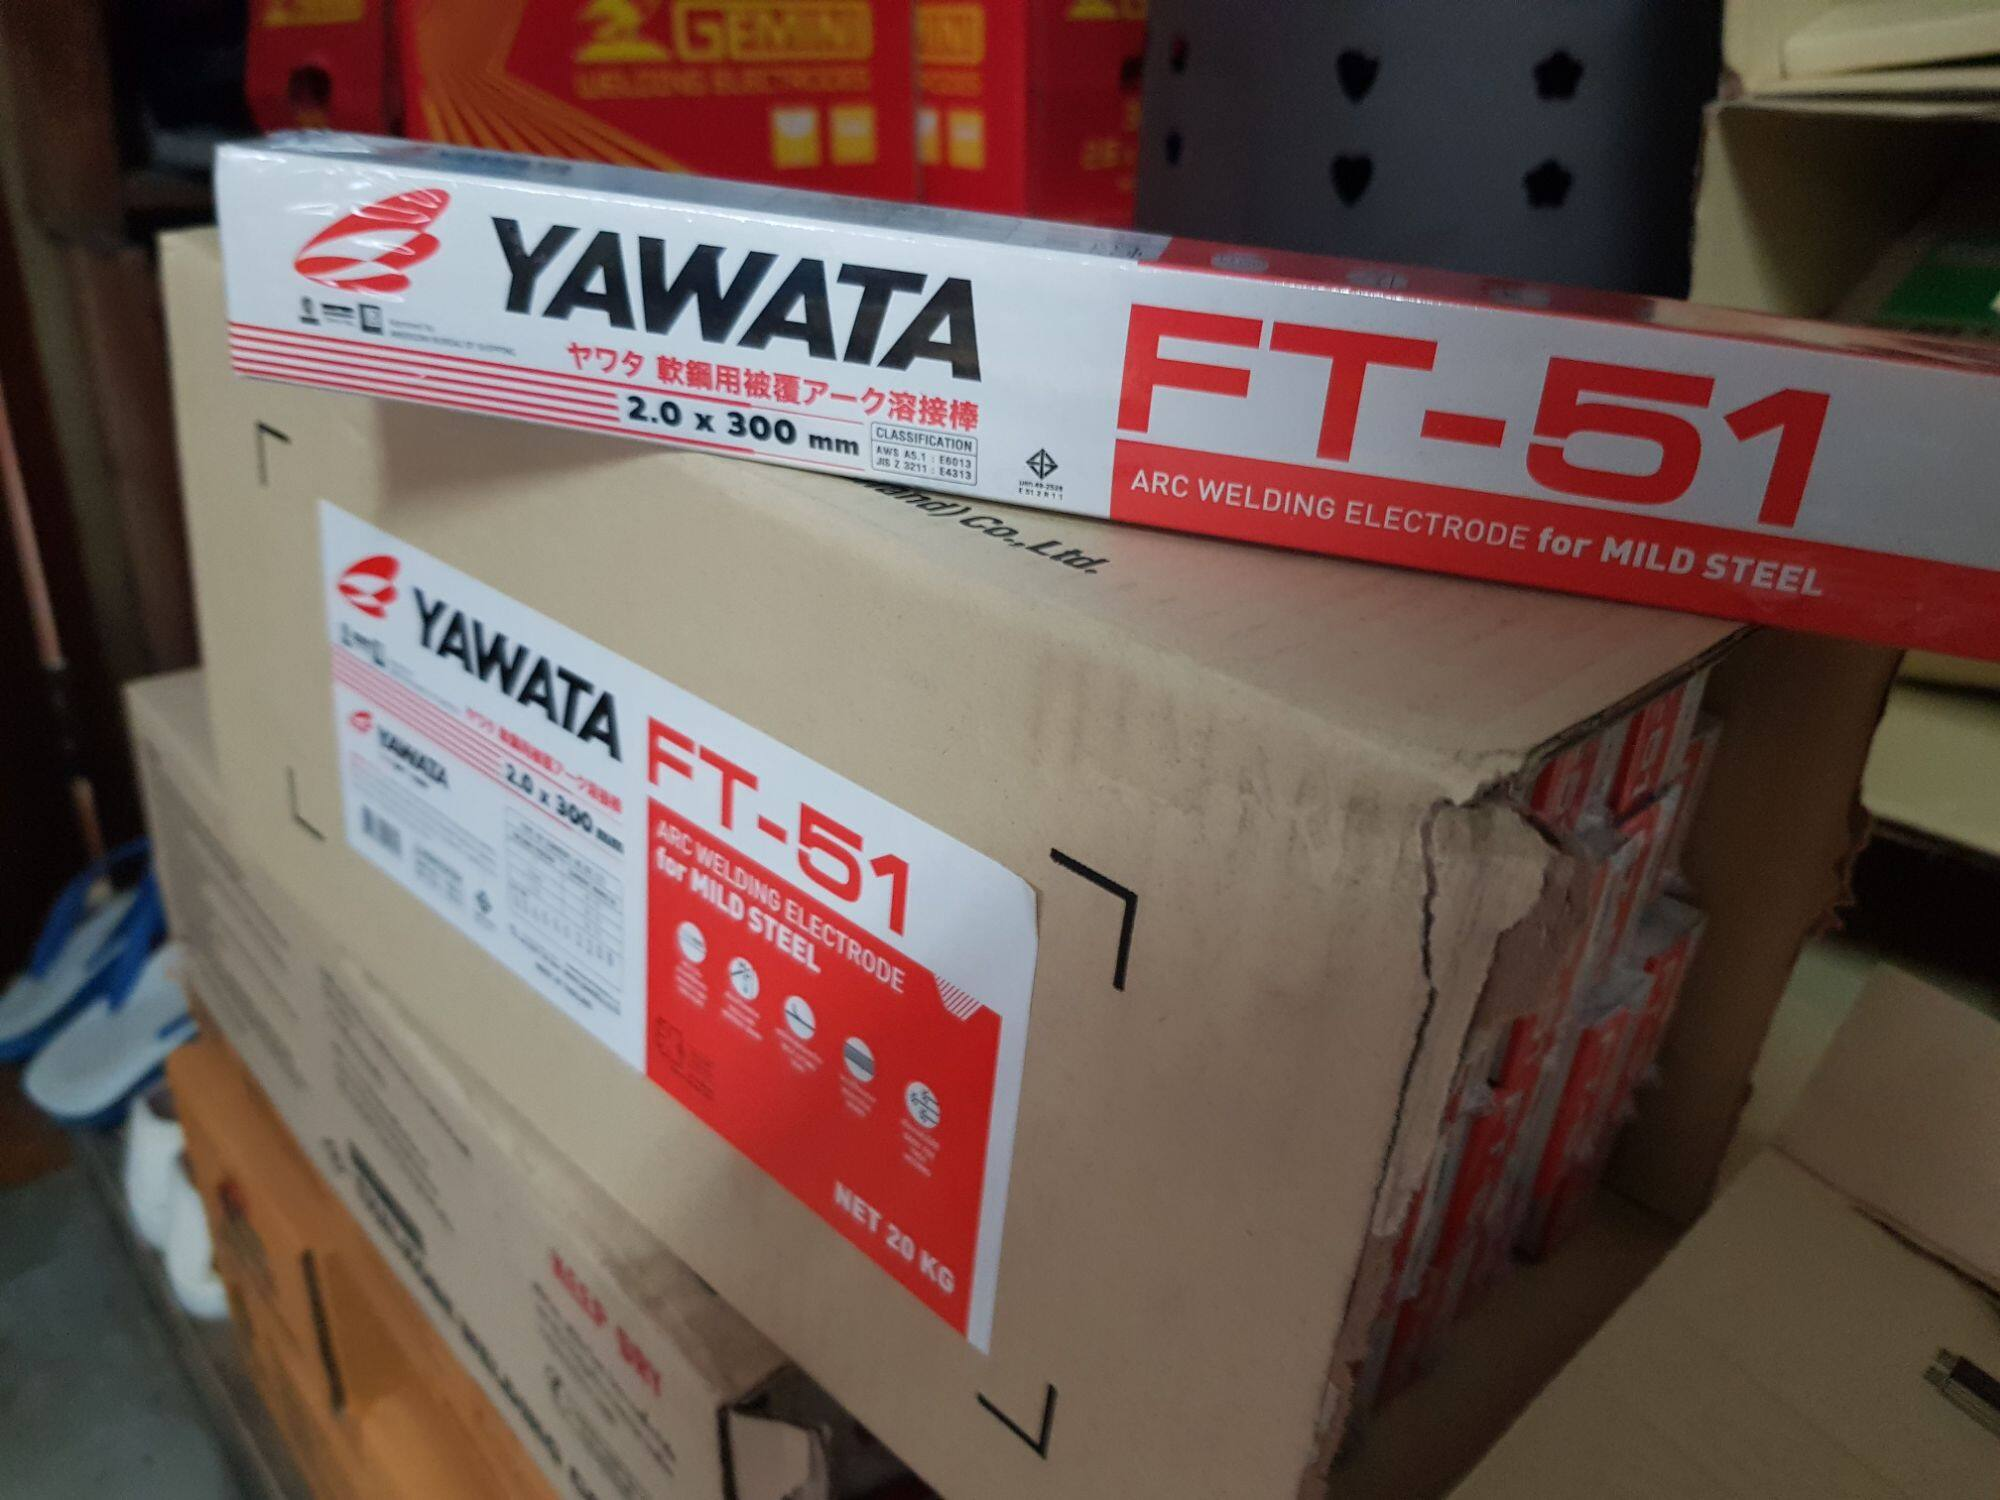 Yawata ลวดเชื่อมเหล็กบาง ยาวาต้า เอฟที51 ขนาด 2.0มม. กล่องละ 1kg ใช้ง่าย แนวเชื่อมสวยเชื่อมเหล็กบางได้ดีมาก เหมาะกับงาน DIY  yawata ft51 2.0